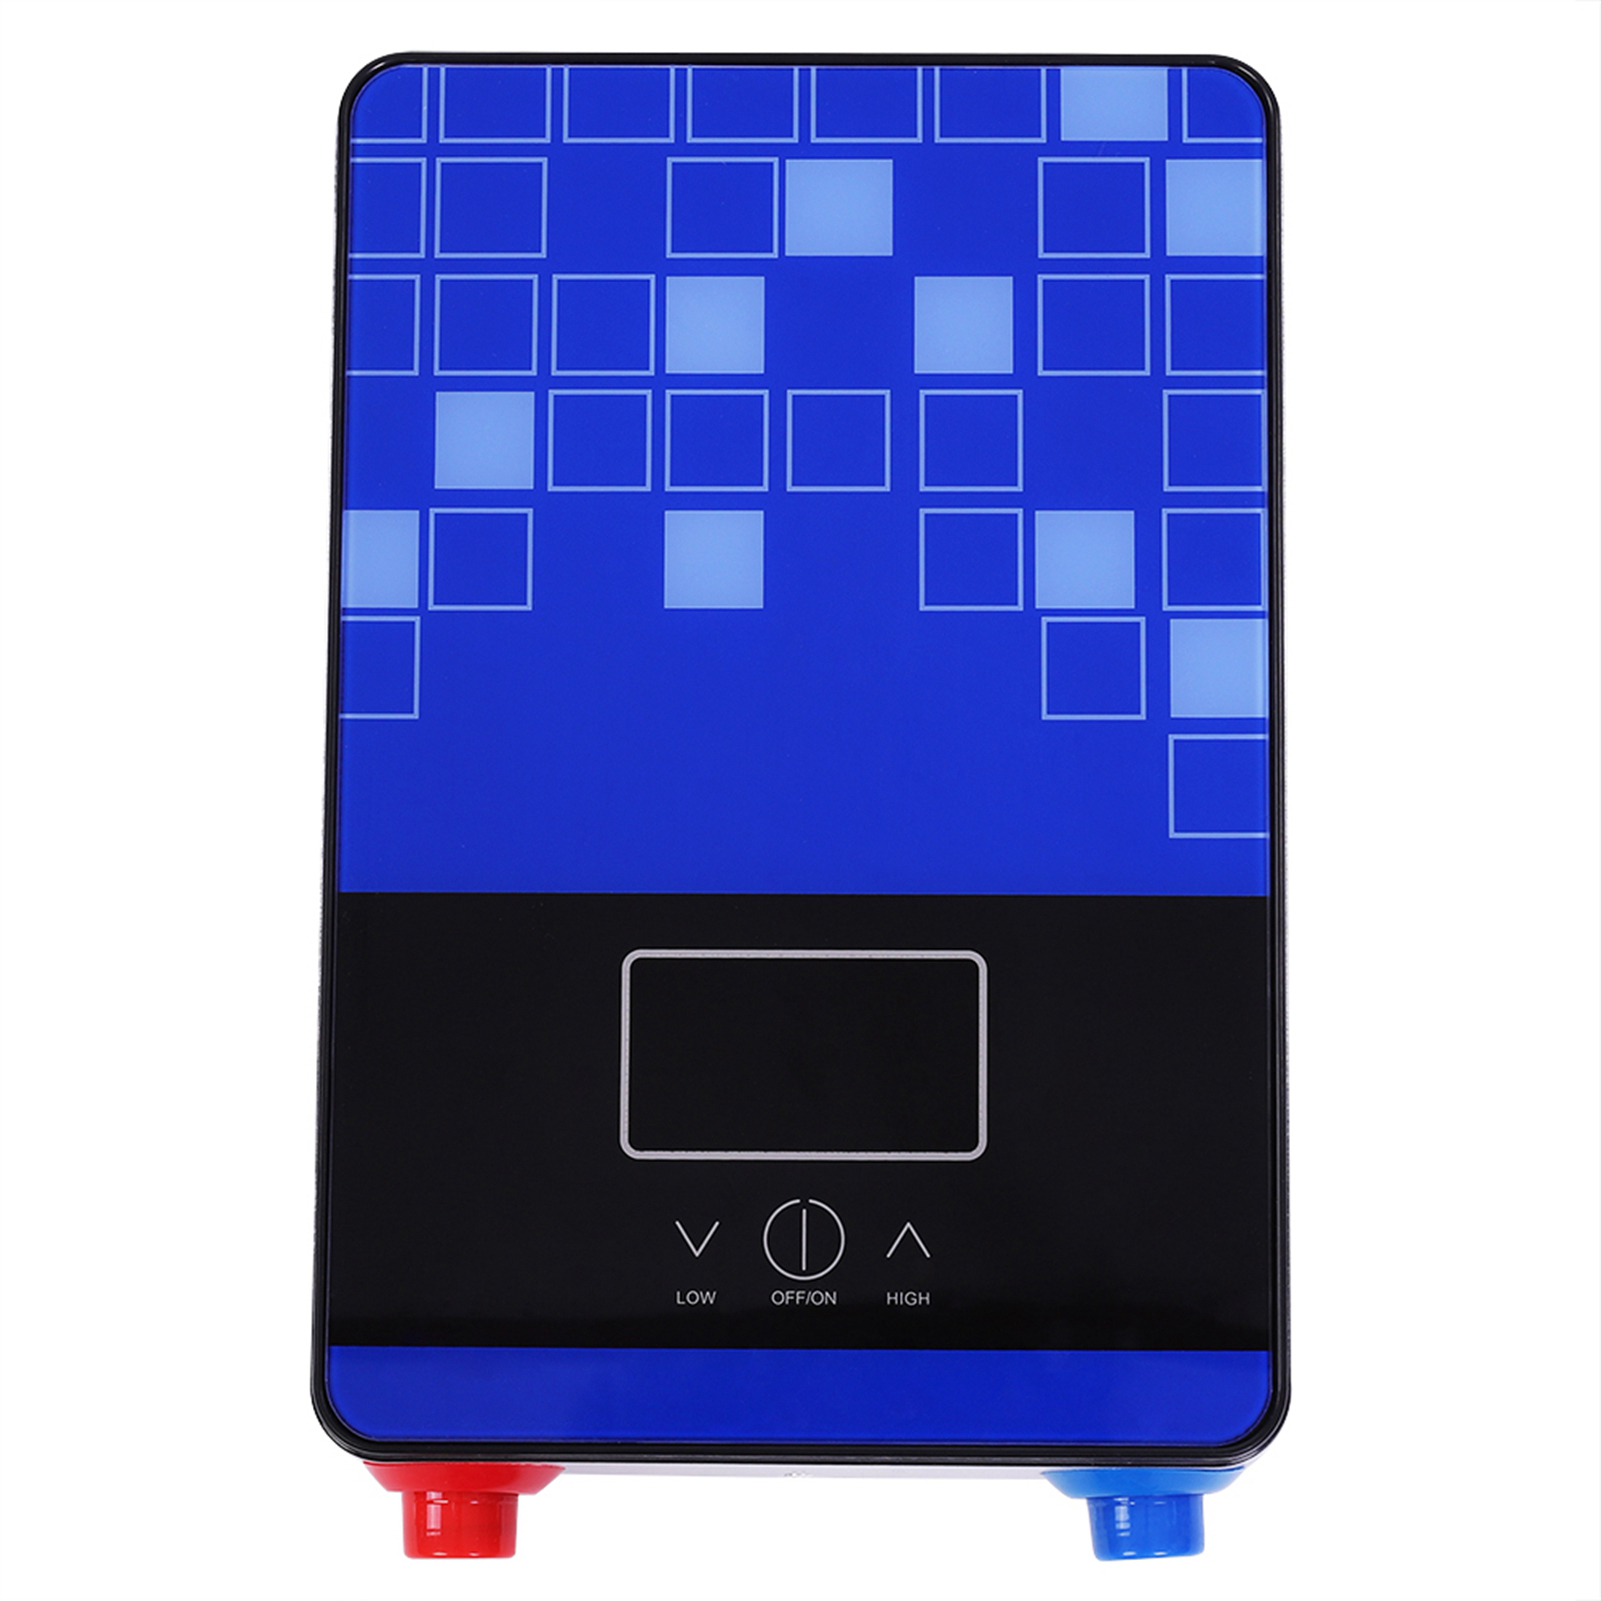 6500w scaldacqua elettrico istantaneo scaldabagno tankless doccia bagno scaldino ebay - Scaldabagno istantaneo elettrico ...